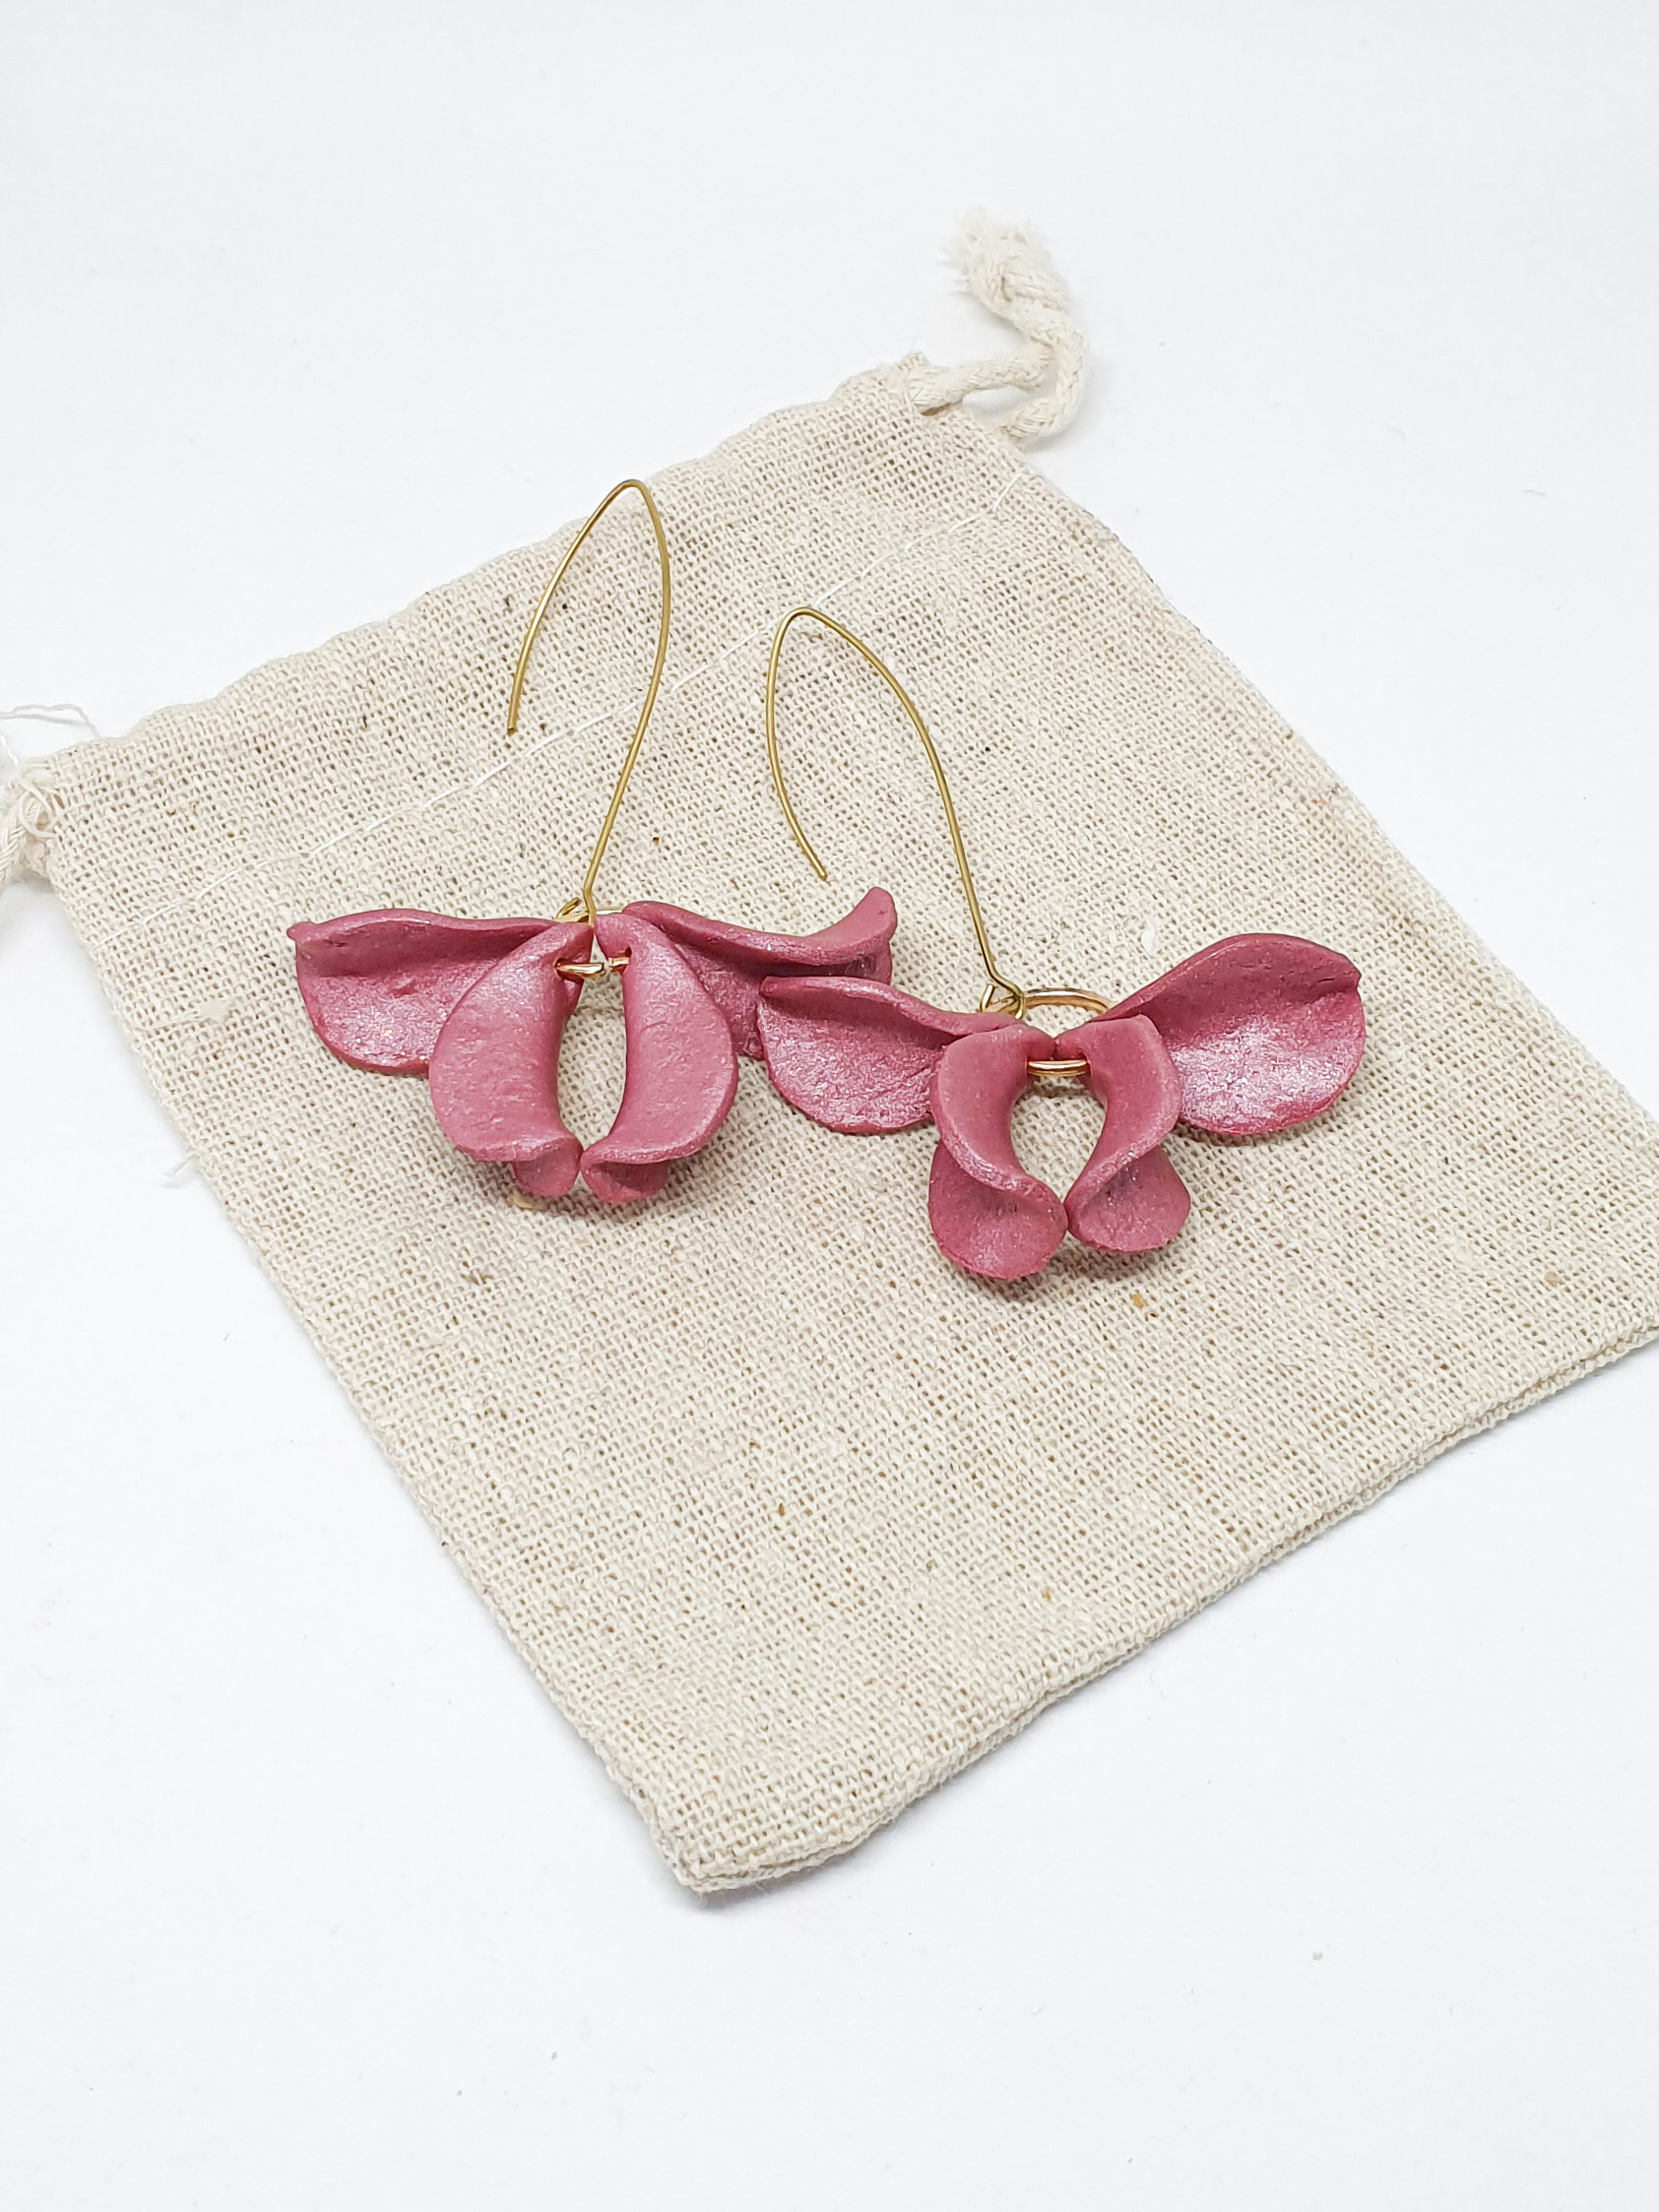 Glistening Pink Primarosa Earrings by Mandarina by Dre | Inspire Me Latin America